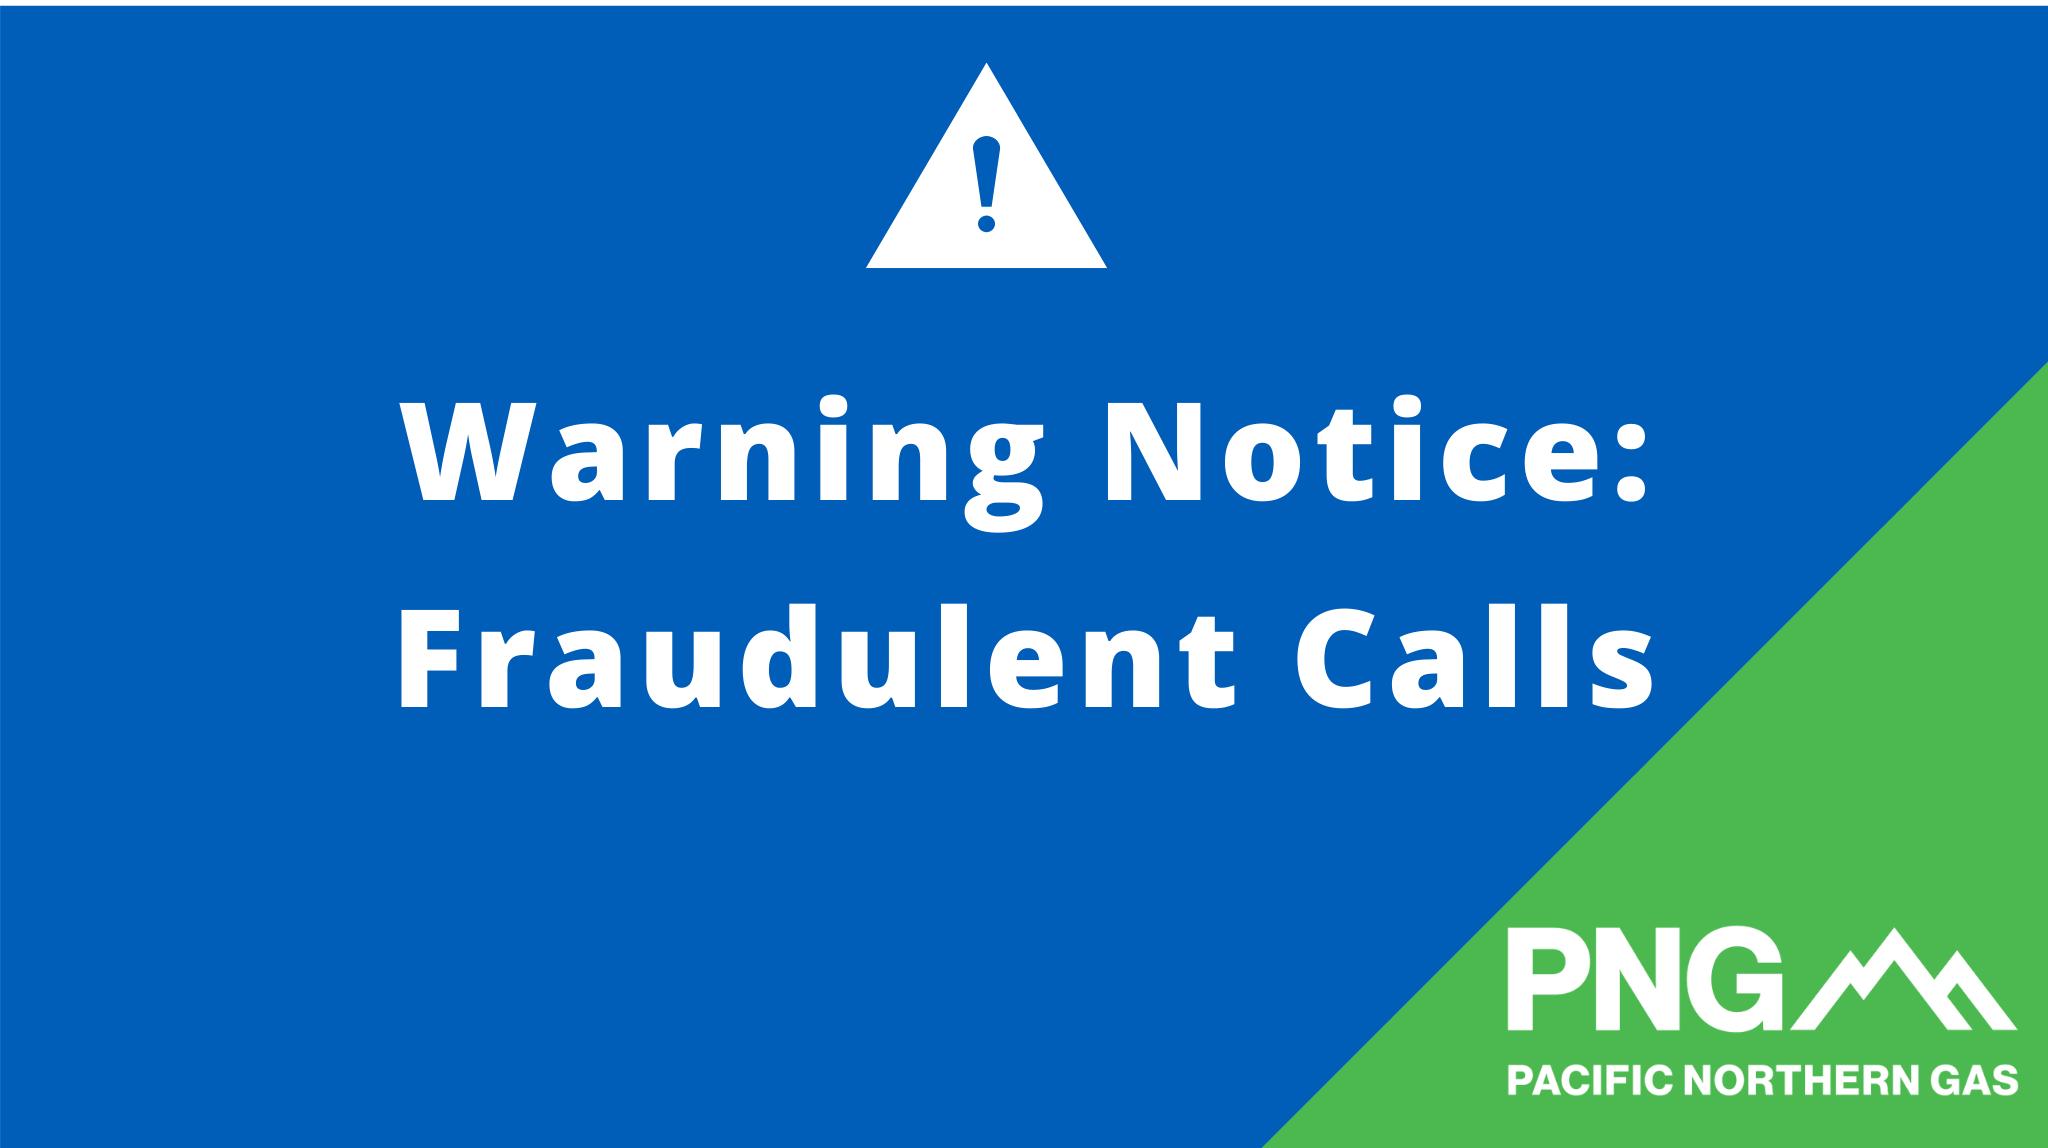 Warning Notice: Fraudulent Calls